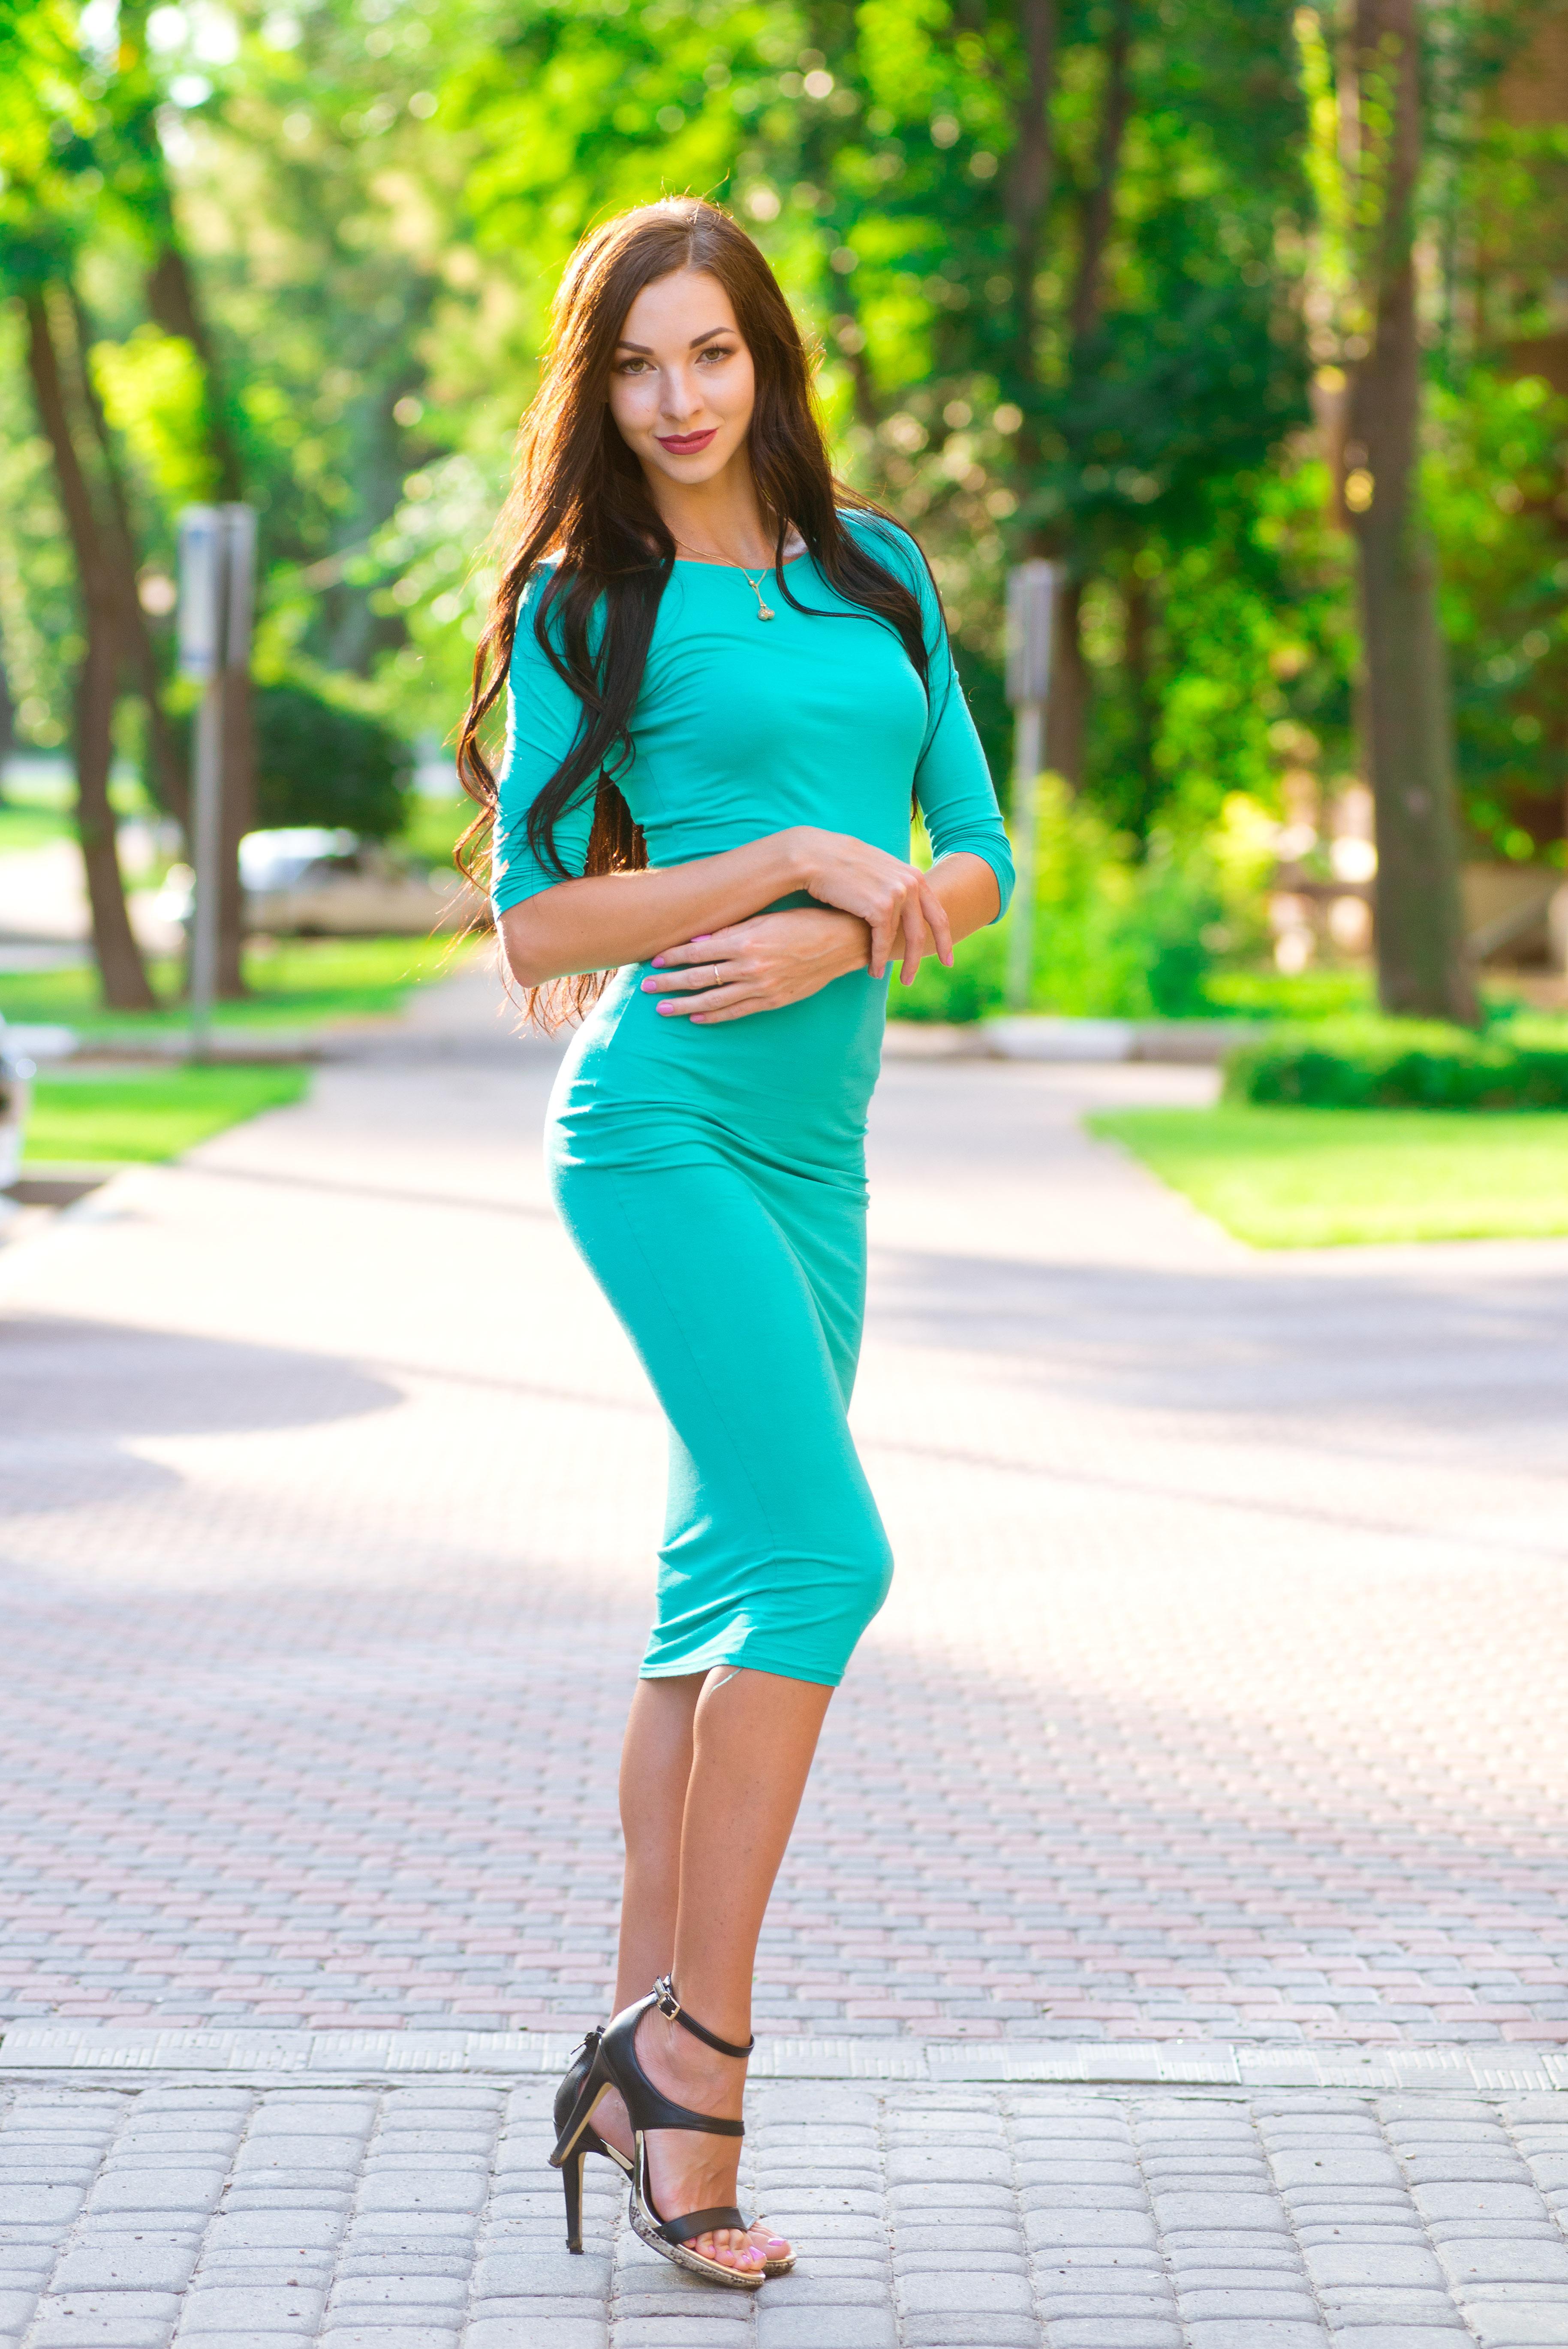 Victoriya, Im 30, from ucraina-zaporizzja - Marriage